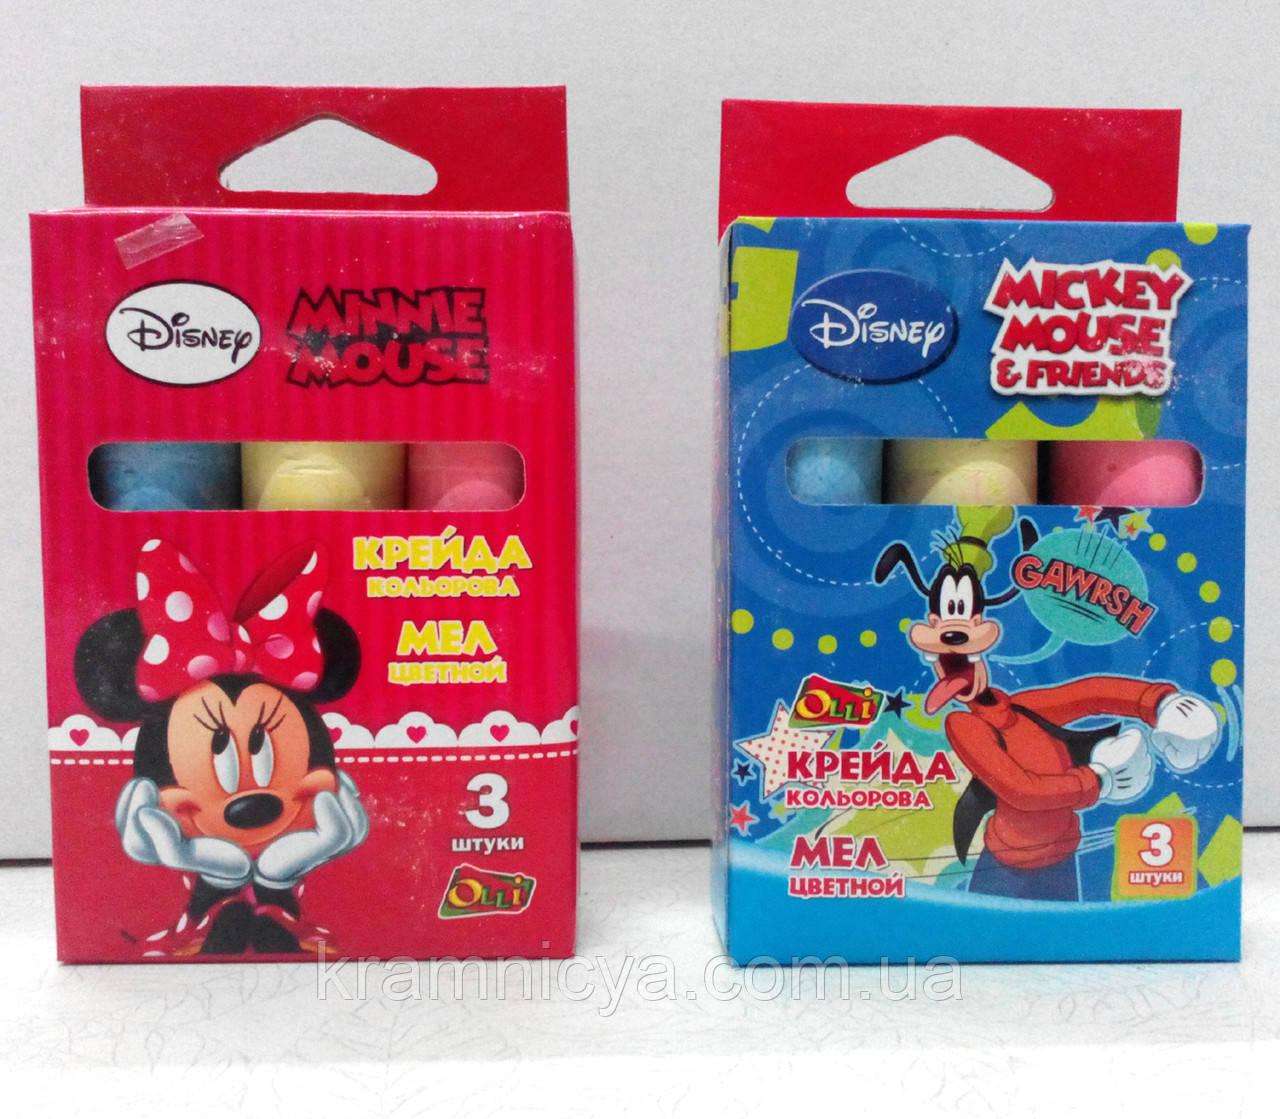 "Мел цветной, круглый Minnie-Mouse/Jumbo, (3 цвета) ТМ ""Olli"" - Интернет-магазин ""Крамниця творчості"" в Виннице"